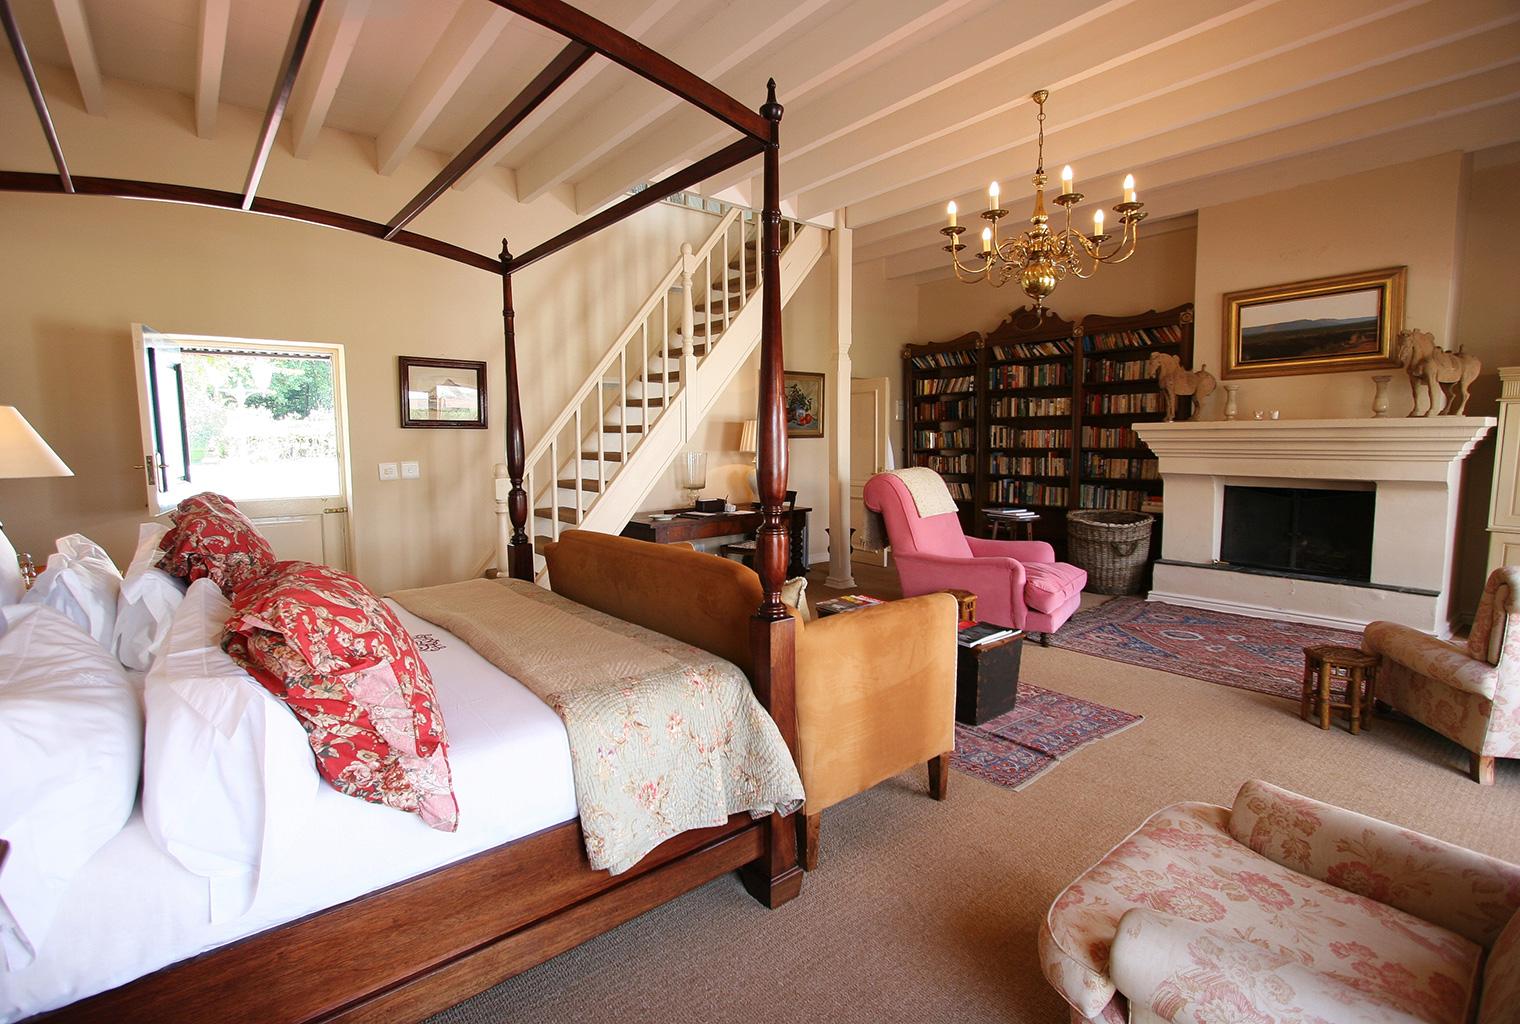 Kurland-Luxury-Hotel-South-Africa-Bedroom